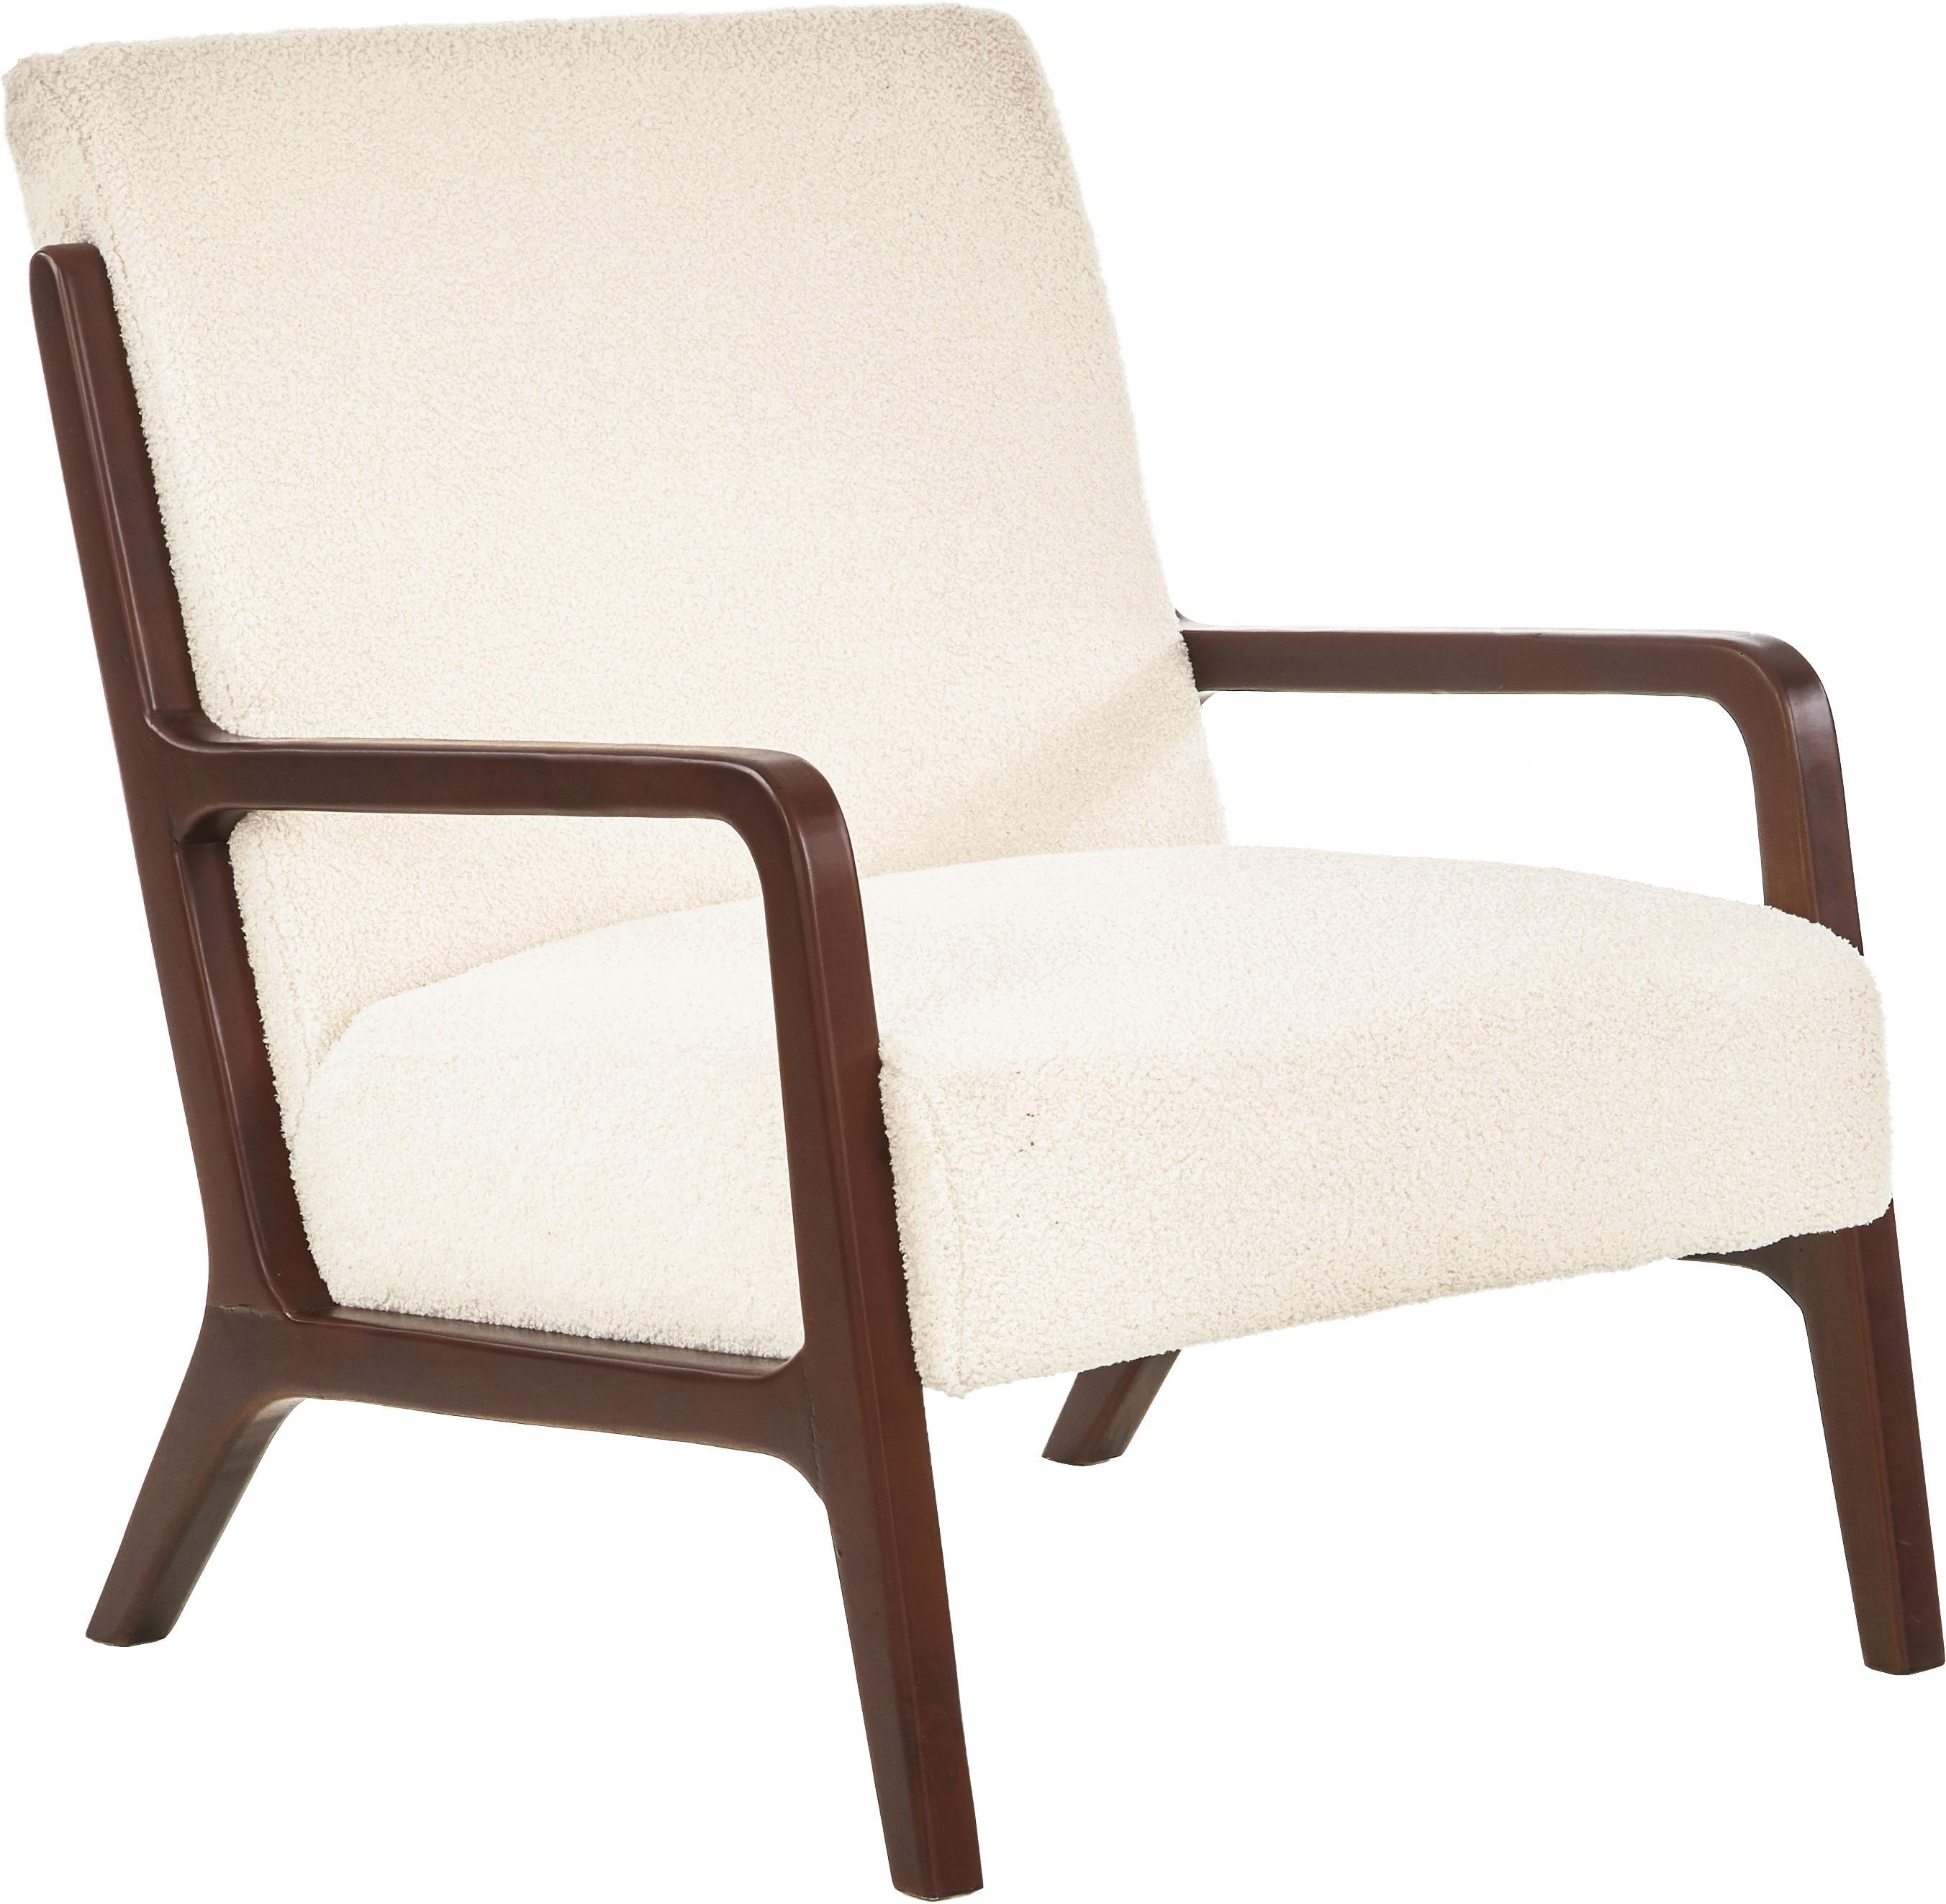 Teddy-fauteuil Naia met eikenhouten armleuningen, Bekleding: polyester (kunstvacht, te, Frame: massief en geolied eikenh, Gebroken wit, B 76 x D 67 cm